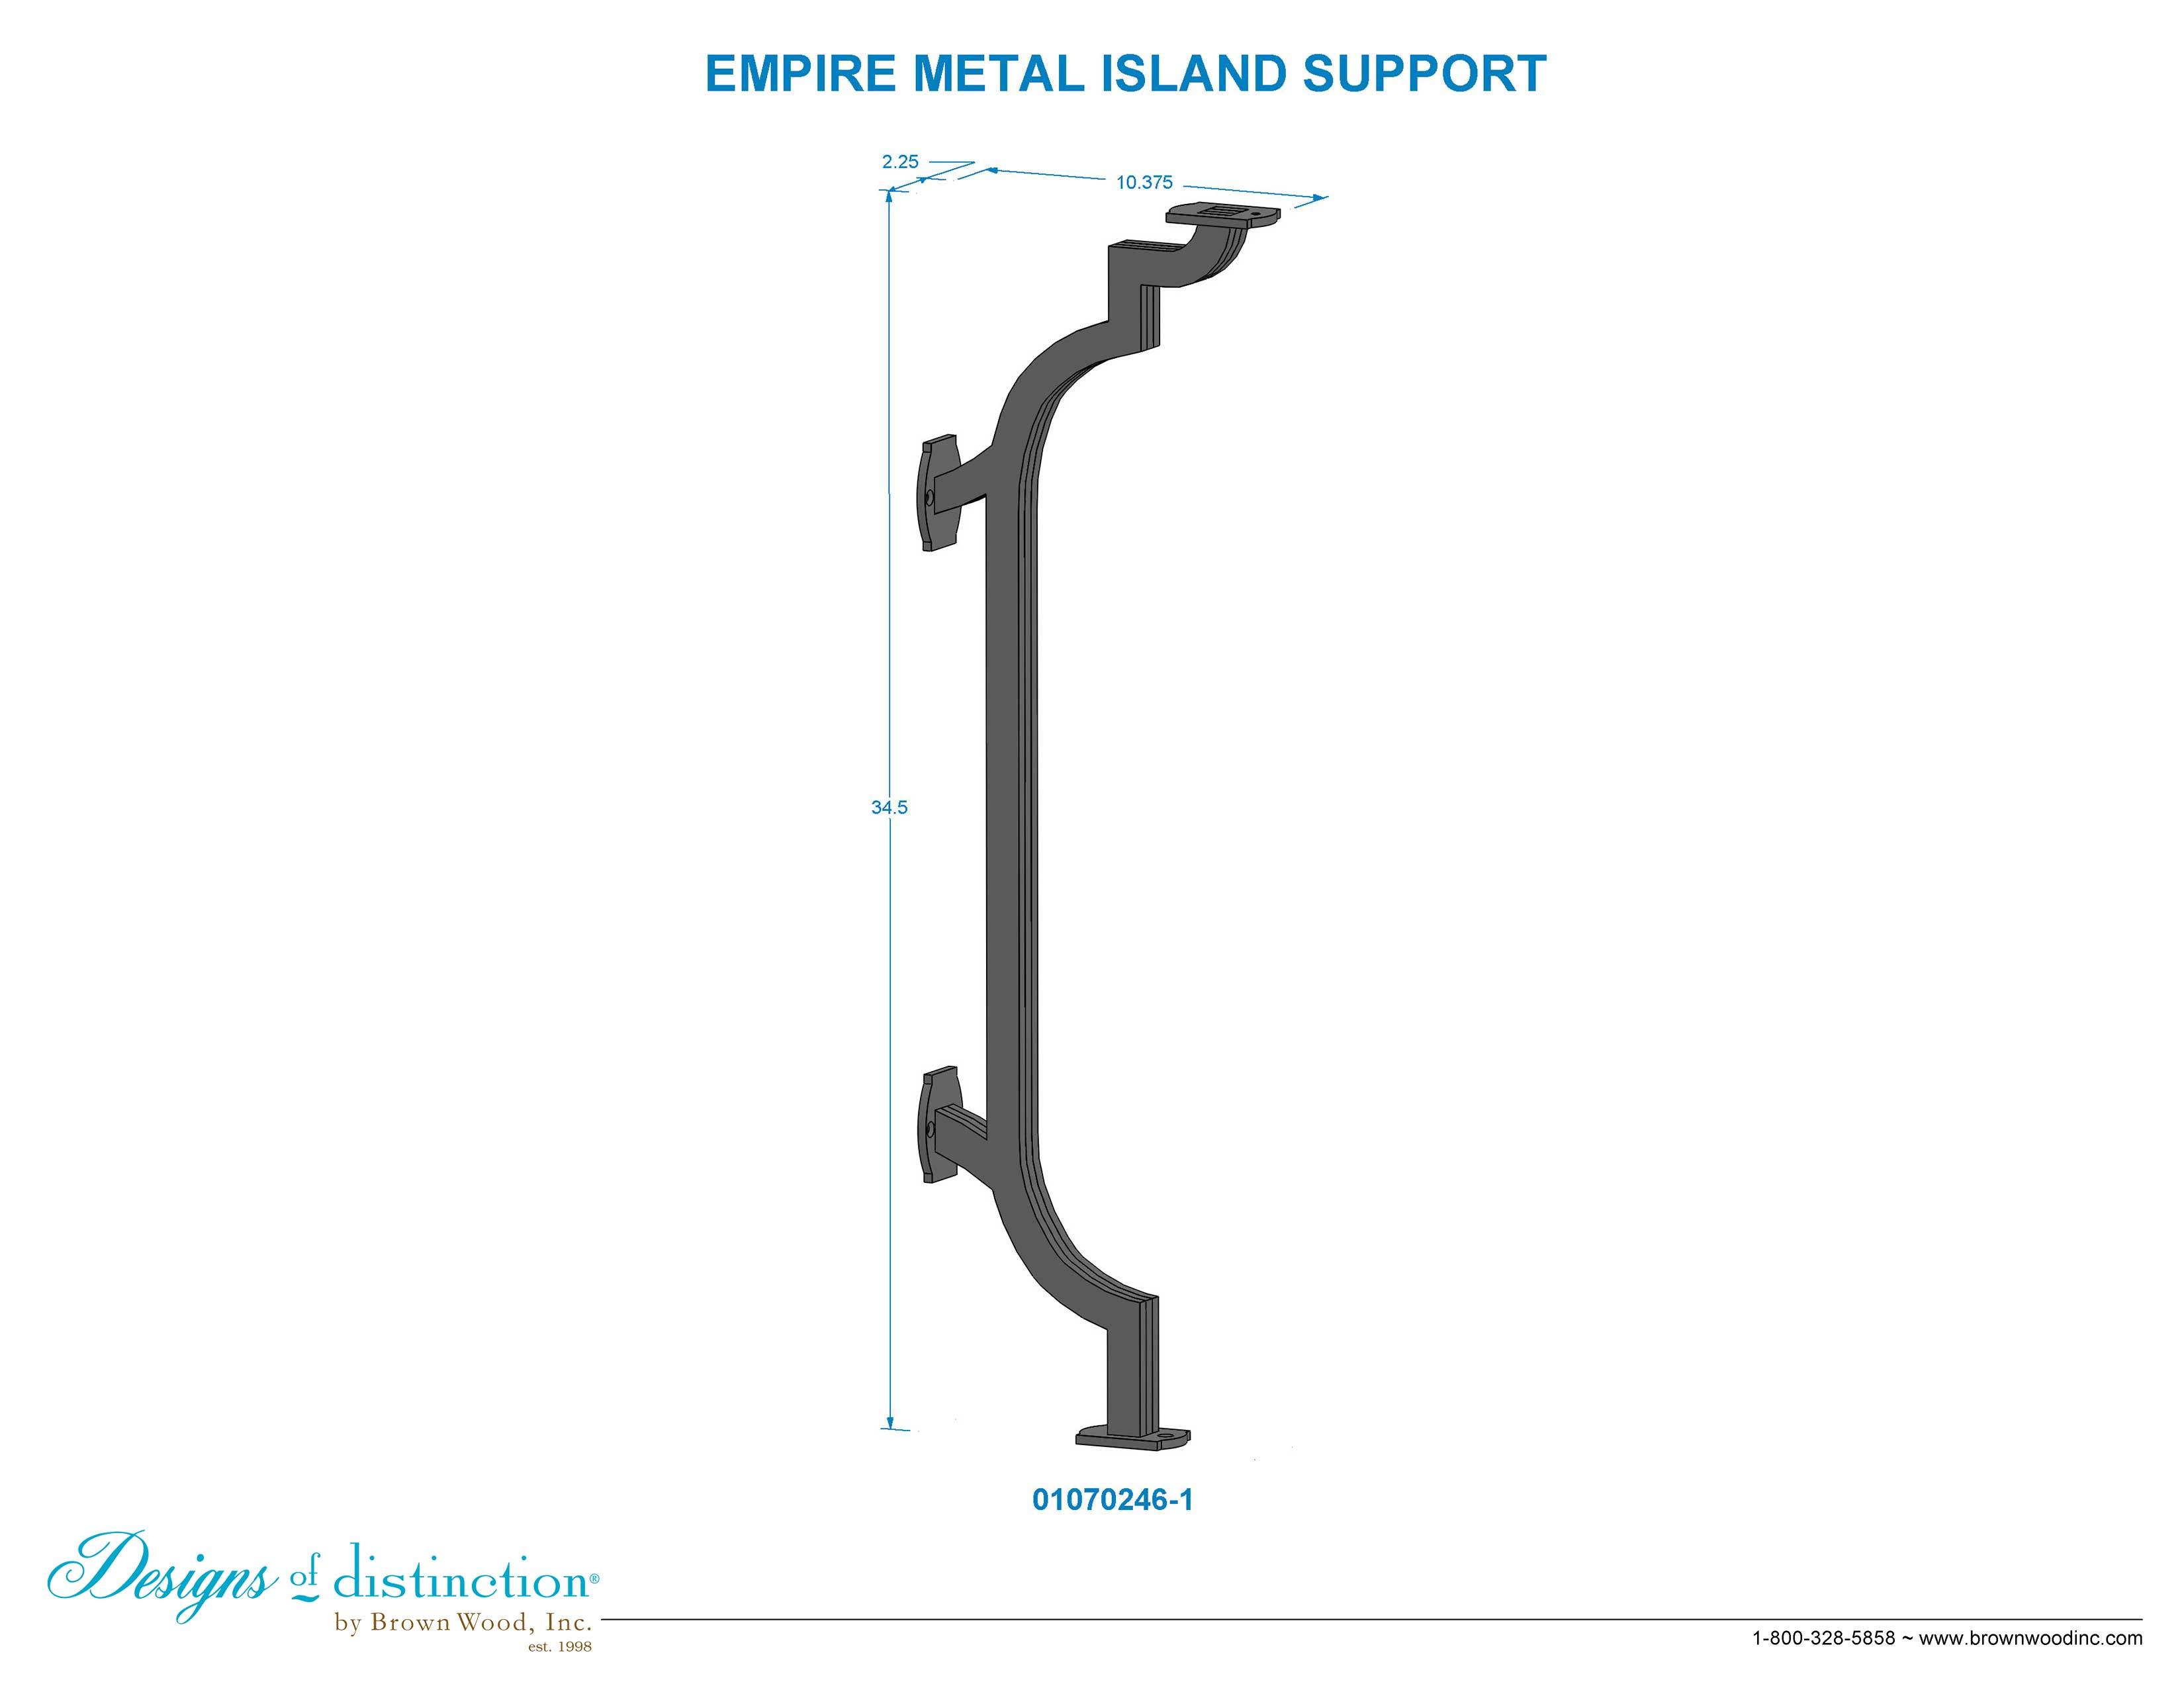 Empire Iron Island Support